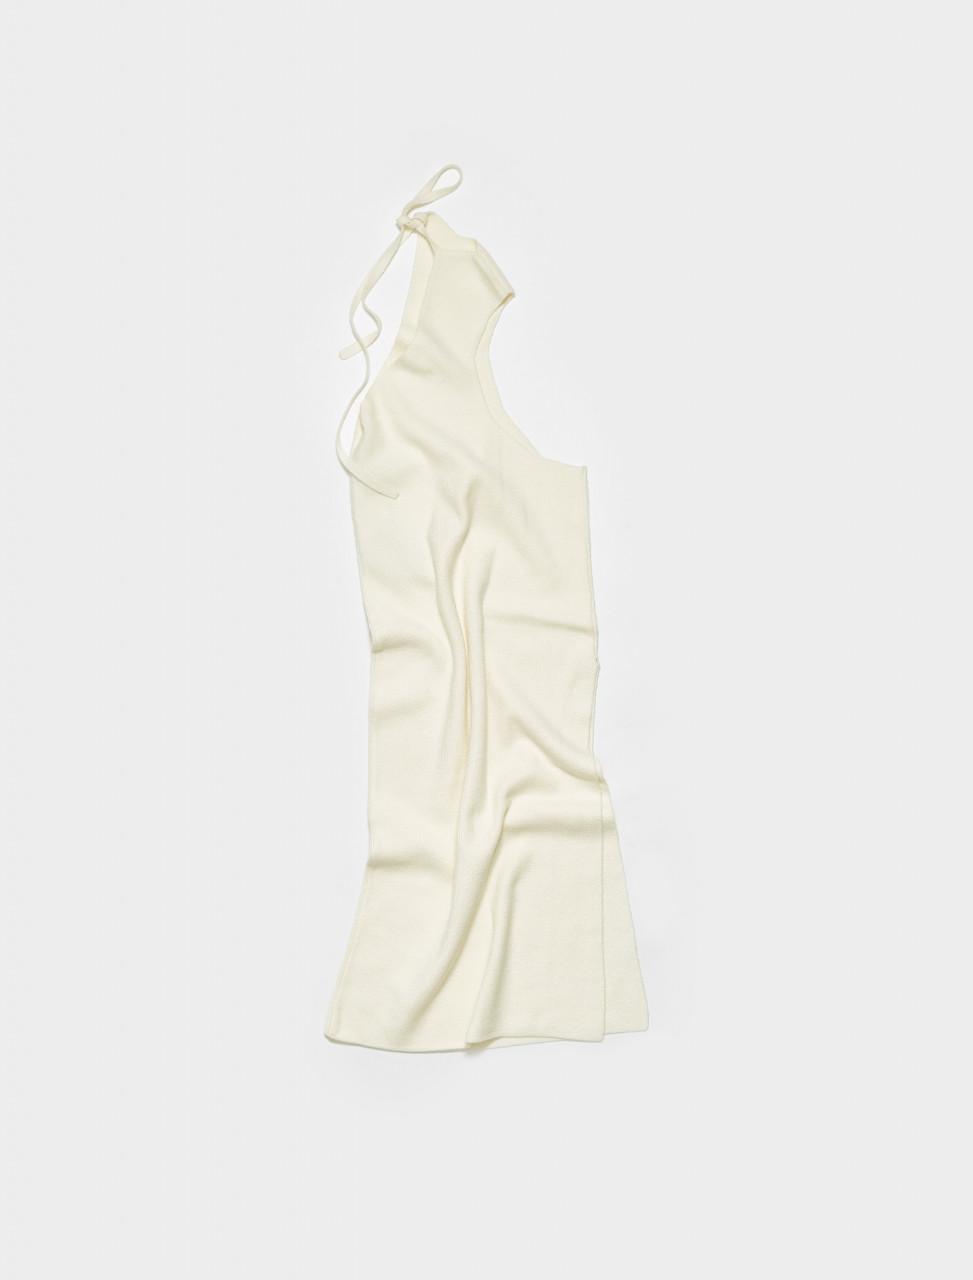 DREMIL ISA BOULDER SPLIT MILK DRESS IN MILK WHITE